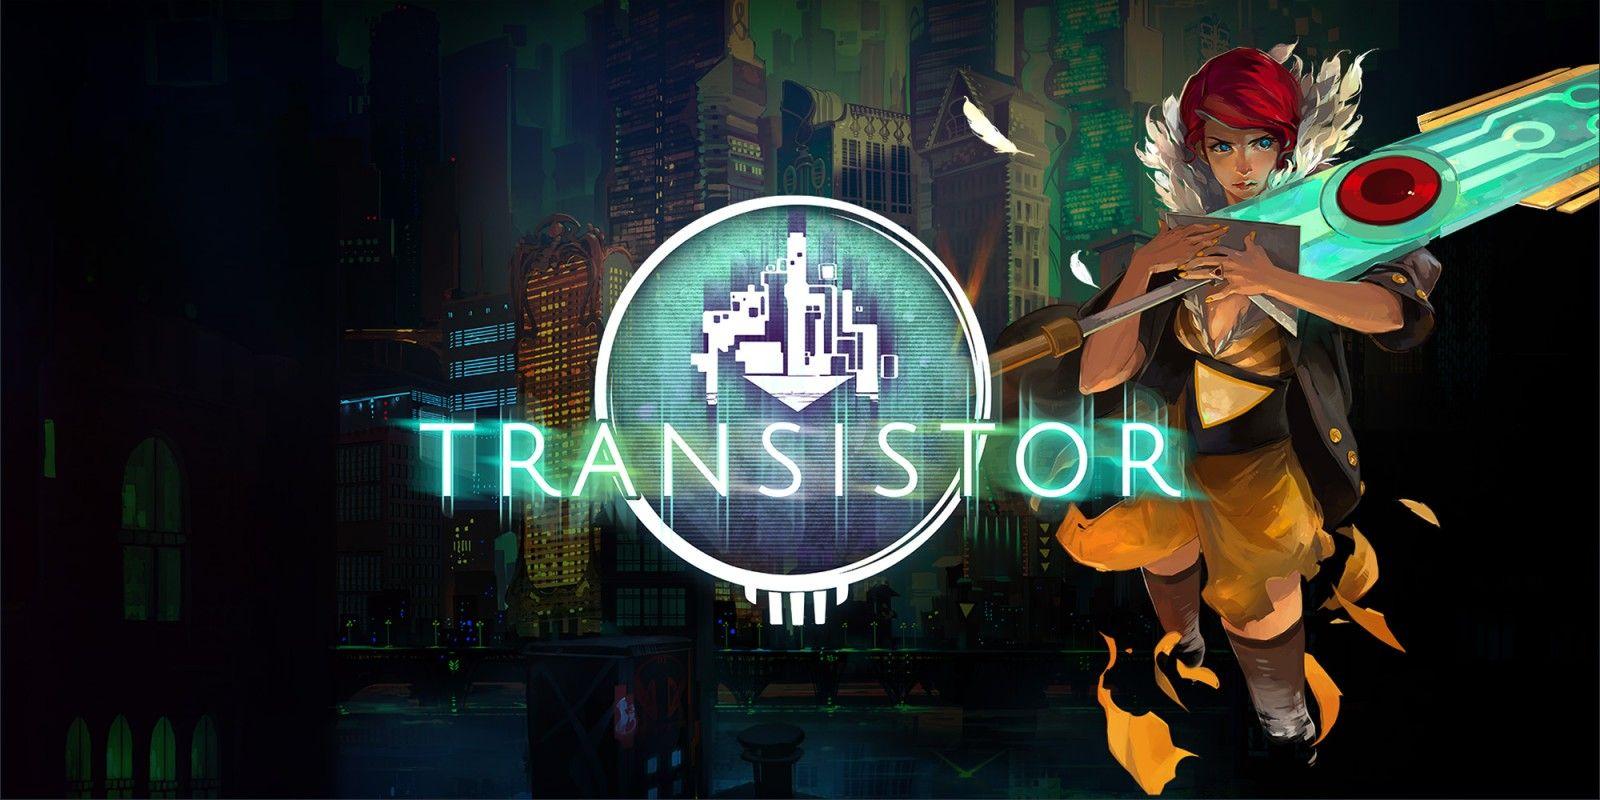 Transistor (Nintendo Switch) - 26 Rand (£1.13 with Revolut) @ Nintendo eShop South Africa